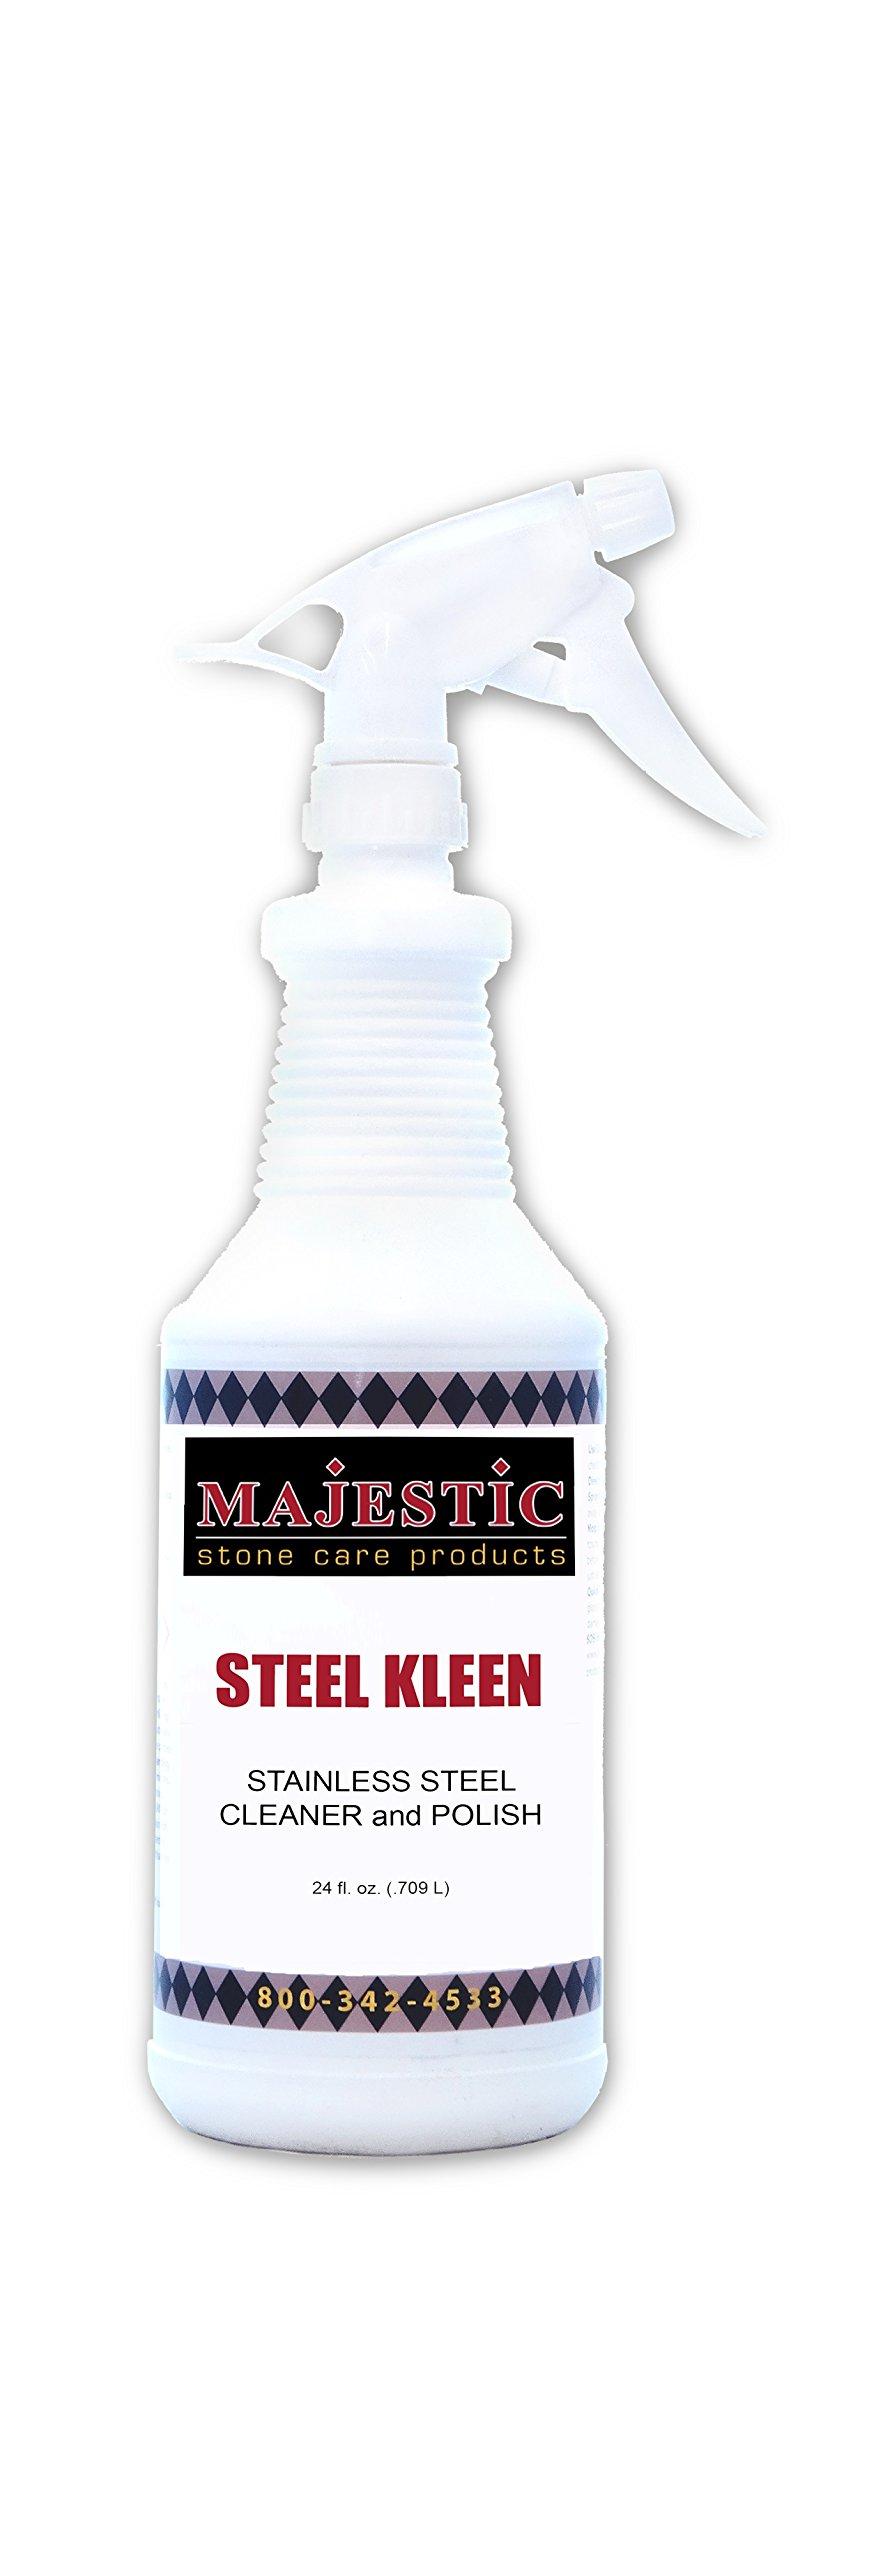 Steel Kleen Stainless Steel Cleaner 24 Oz Case/6